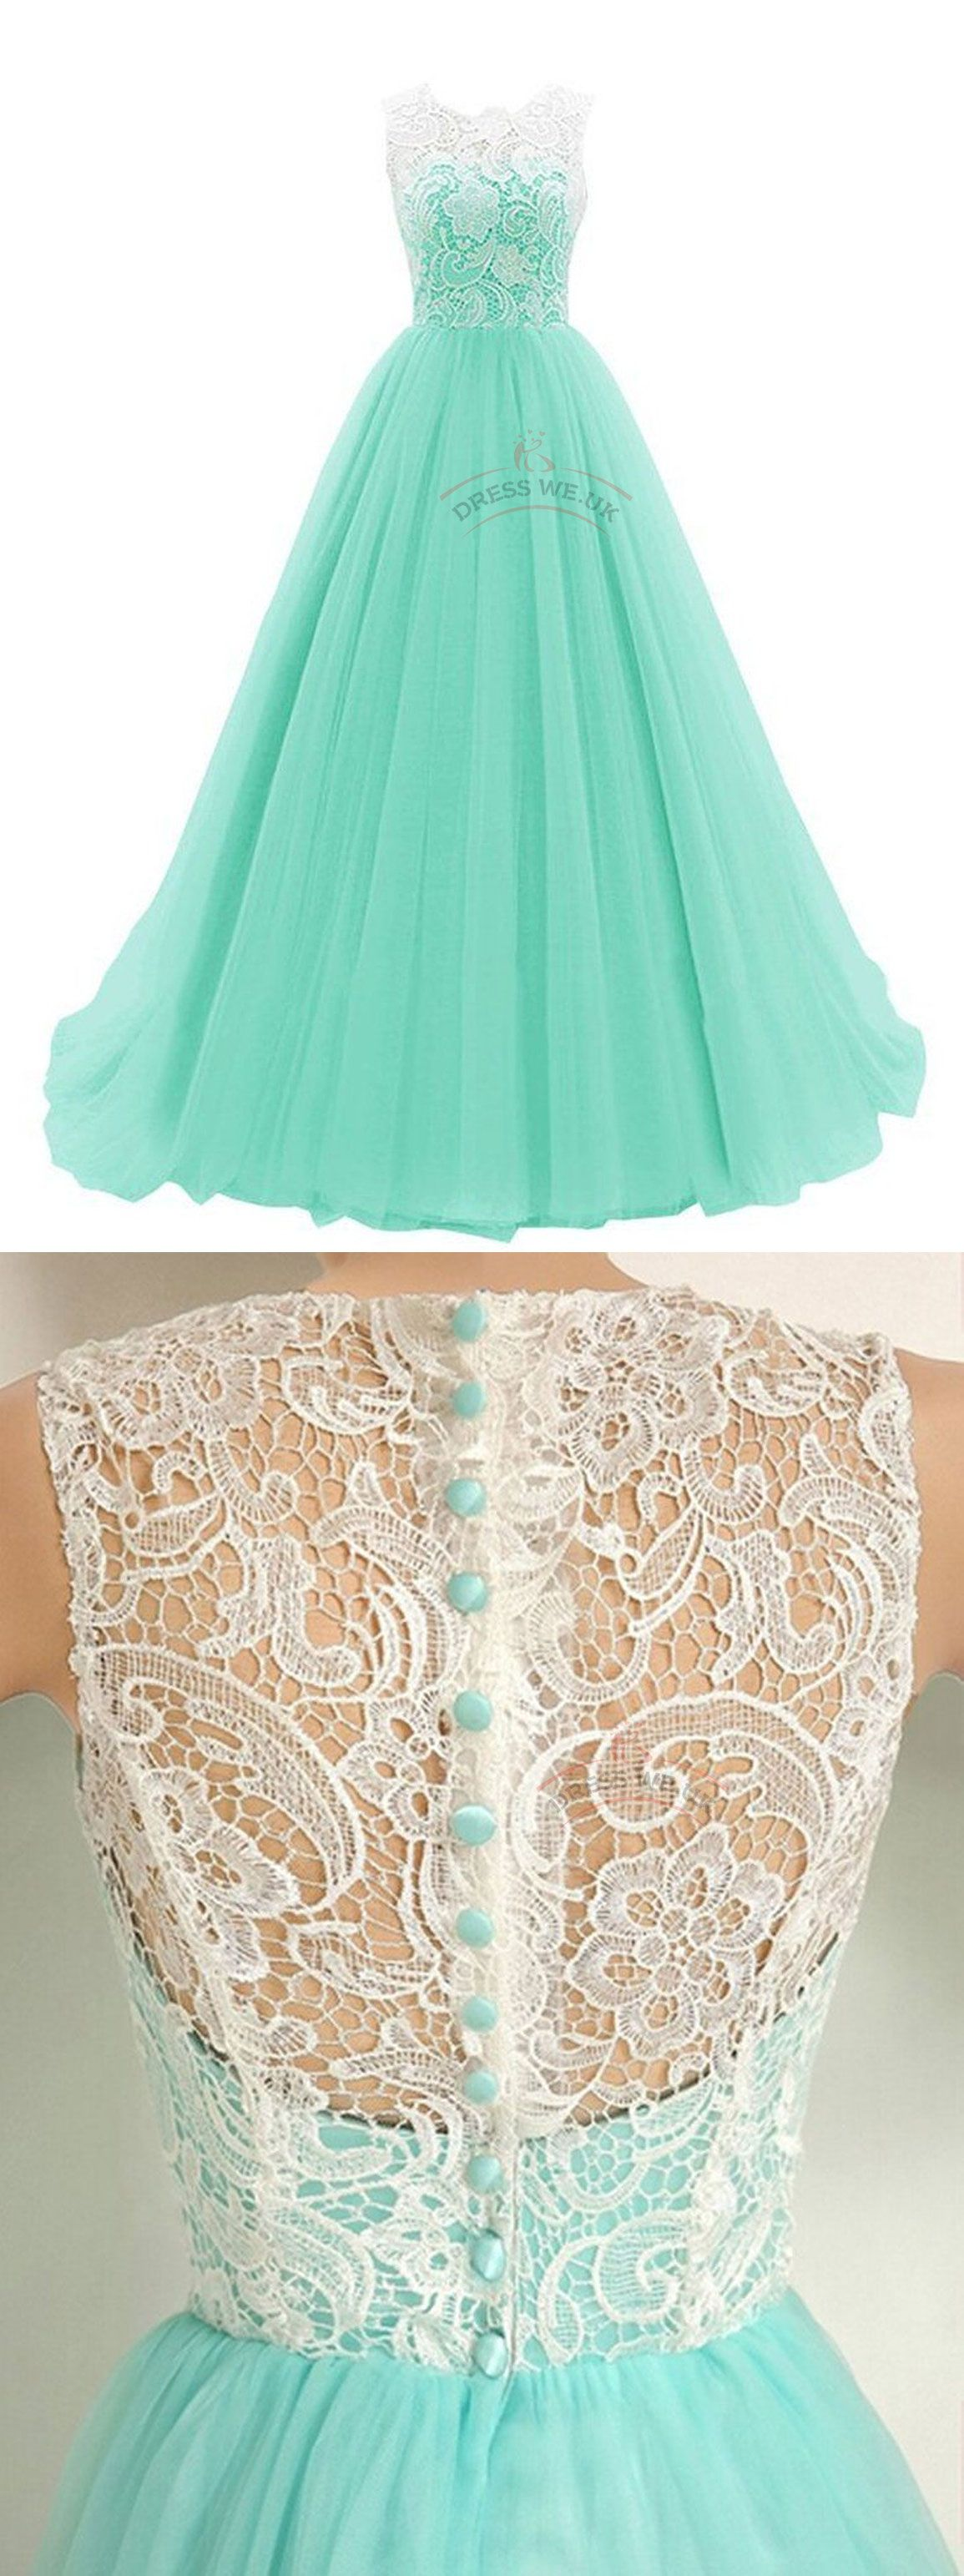 Vendo vestido de añeras u pinteresu